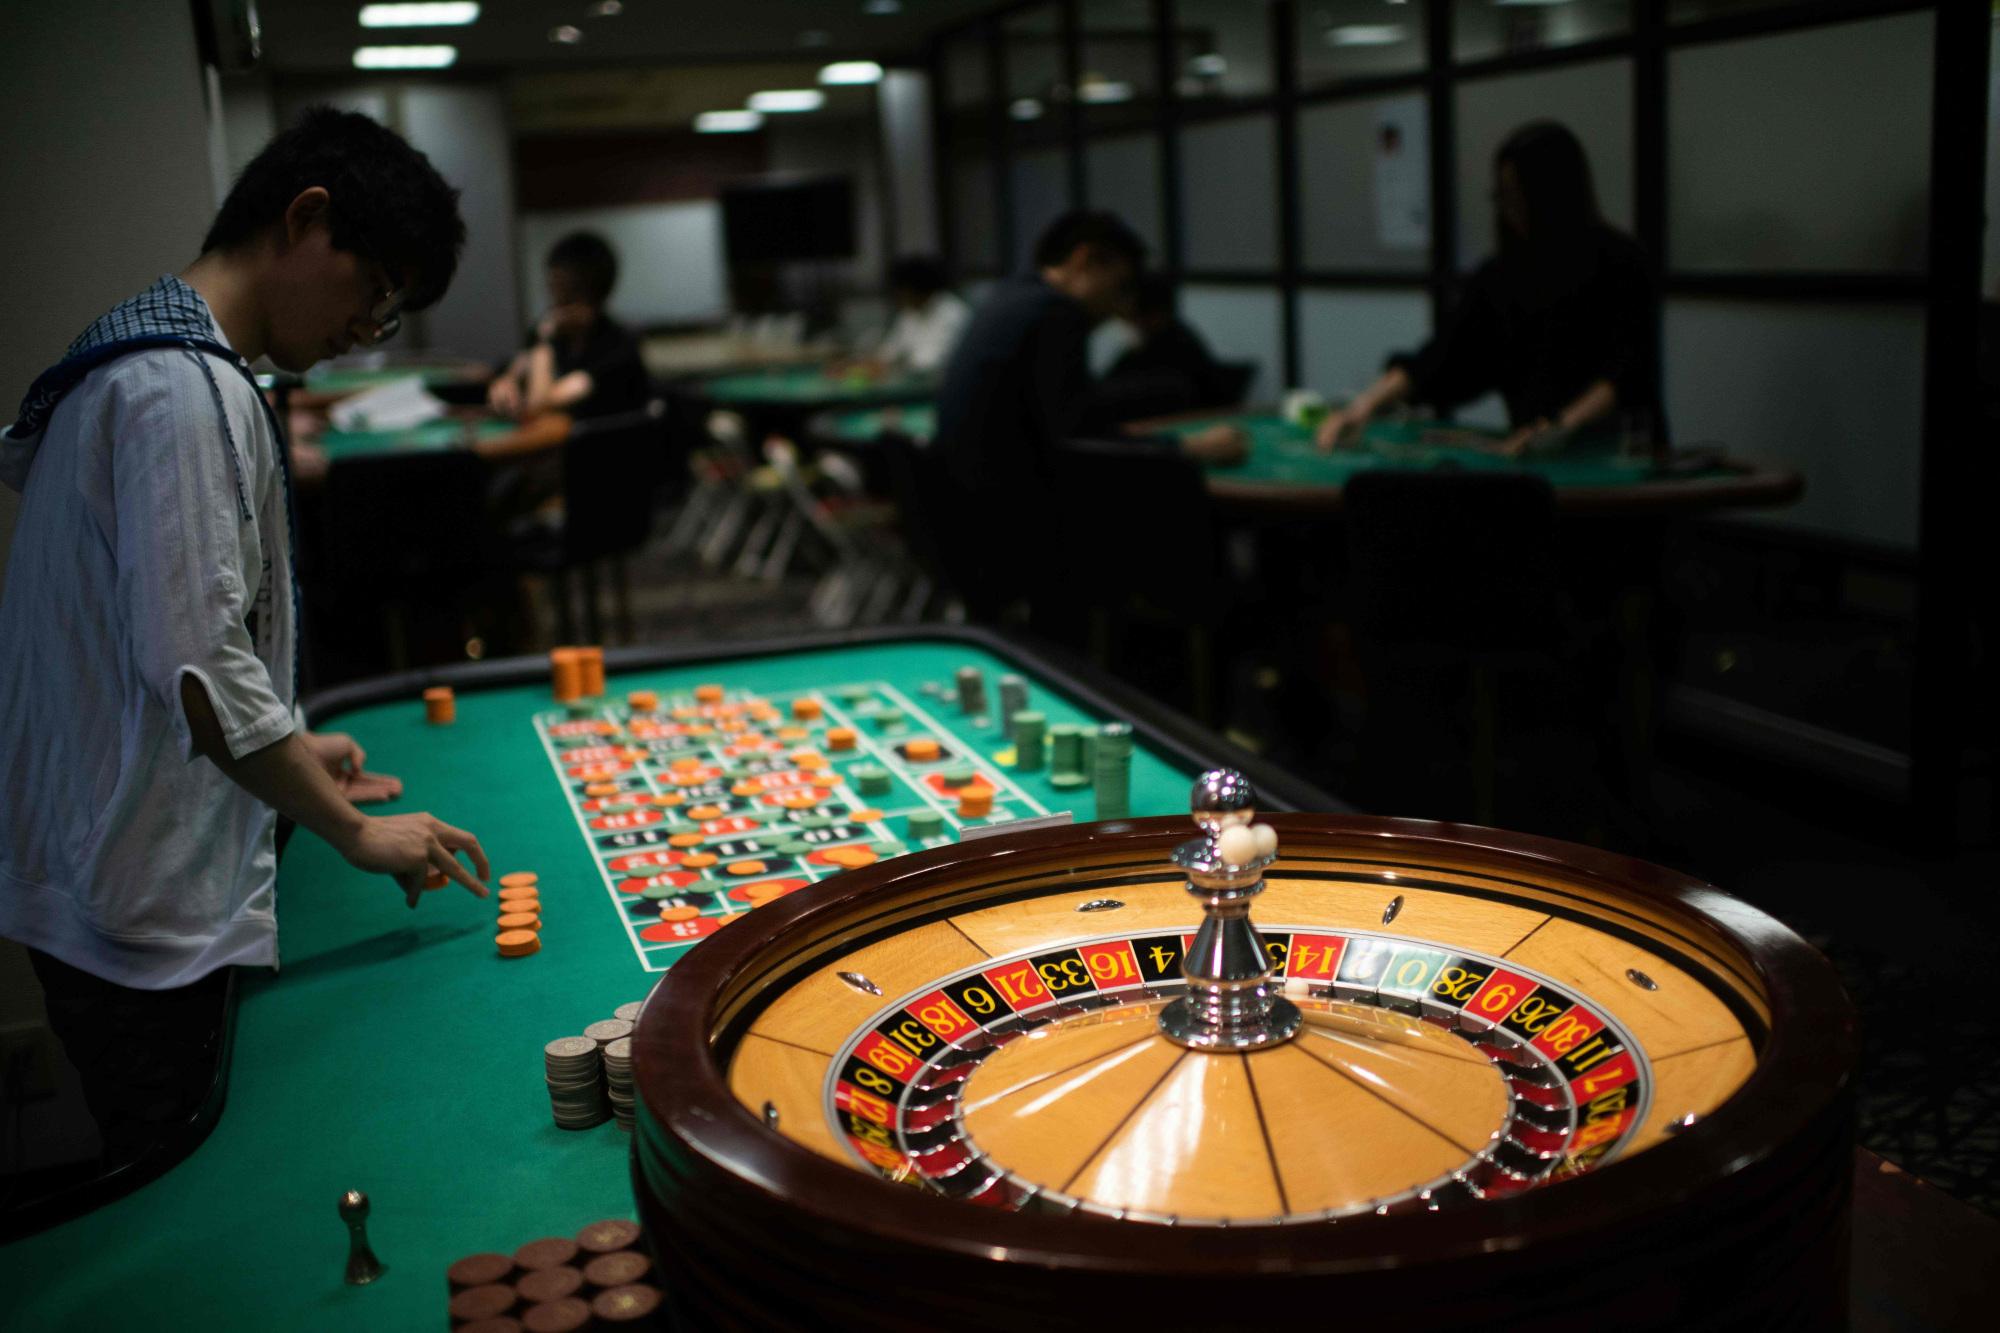 JAPAN-GAMBLING-POLITICS-TOURISM